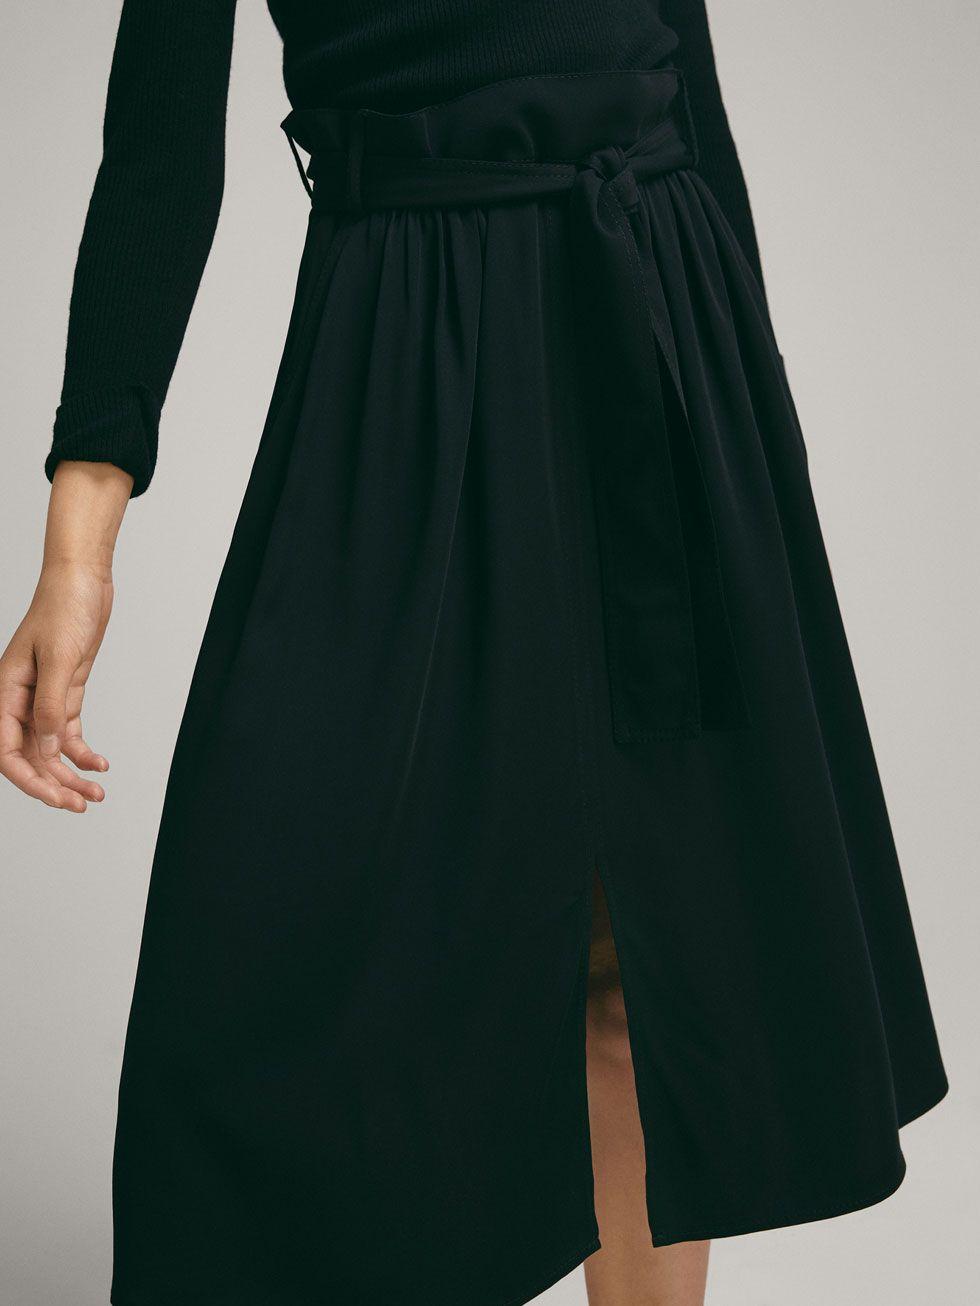 43800b115f SKIRT WITH FRONT SLIT DETAIL - Women - Massimo Dutti Harem Pants,  Silhouette, Zara